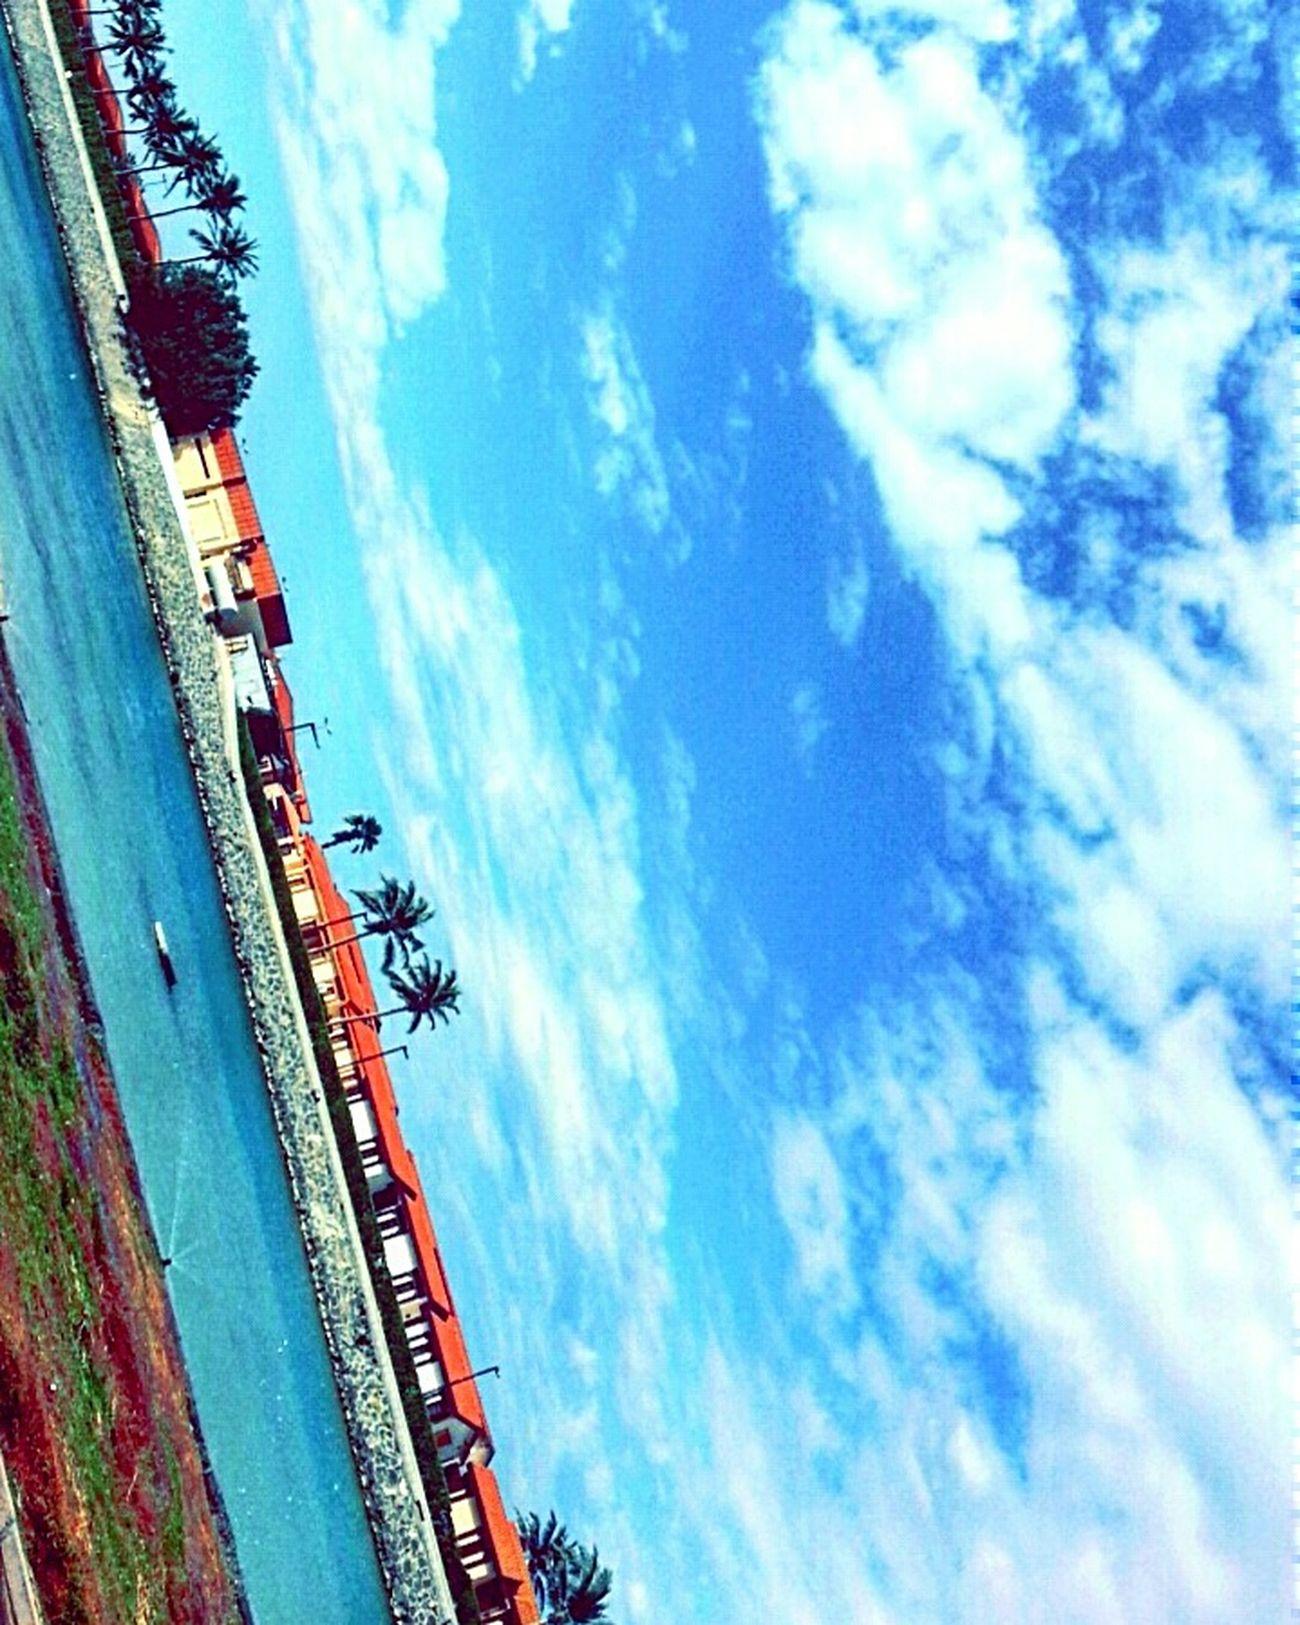 صباح_الغيوم Sweet Moments كلنا_مصورون Sea And Sky بحر_جدة 💙